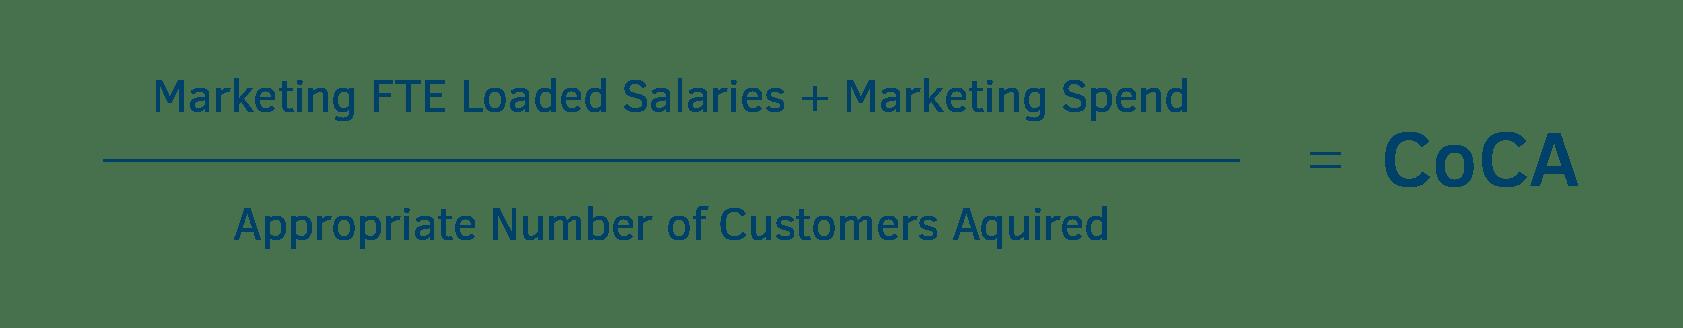 WBG_Blog_Marketing_Metrics_Image_Formula